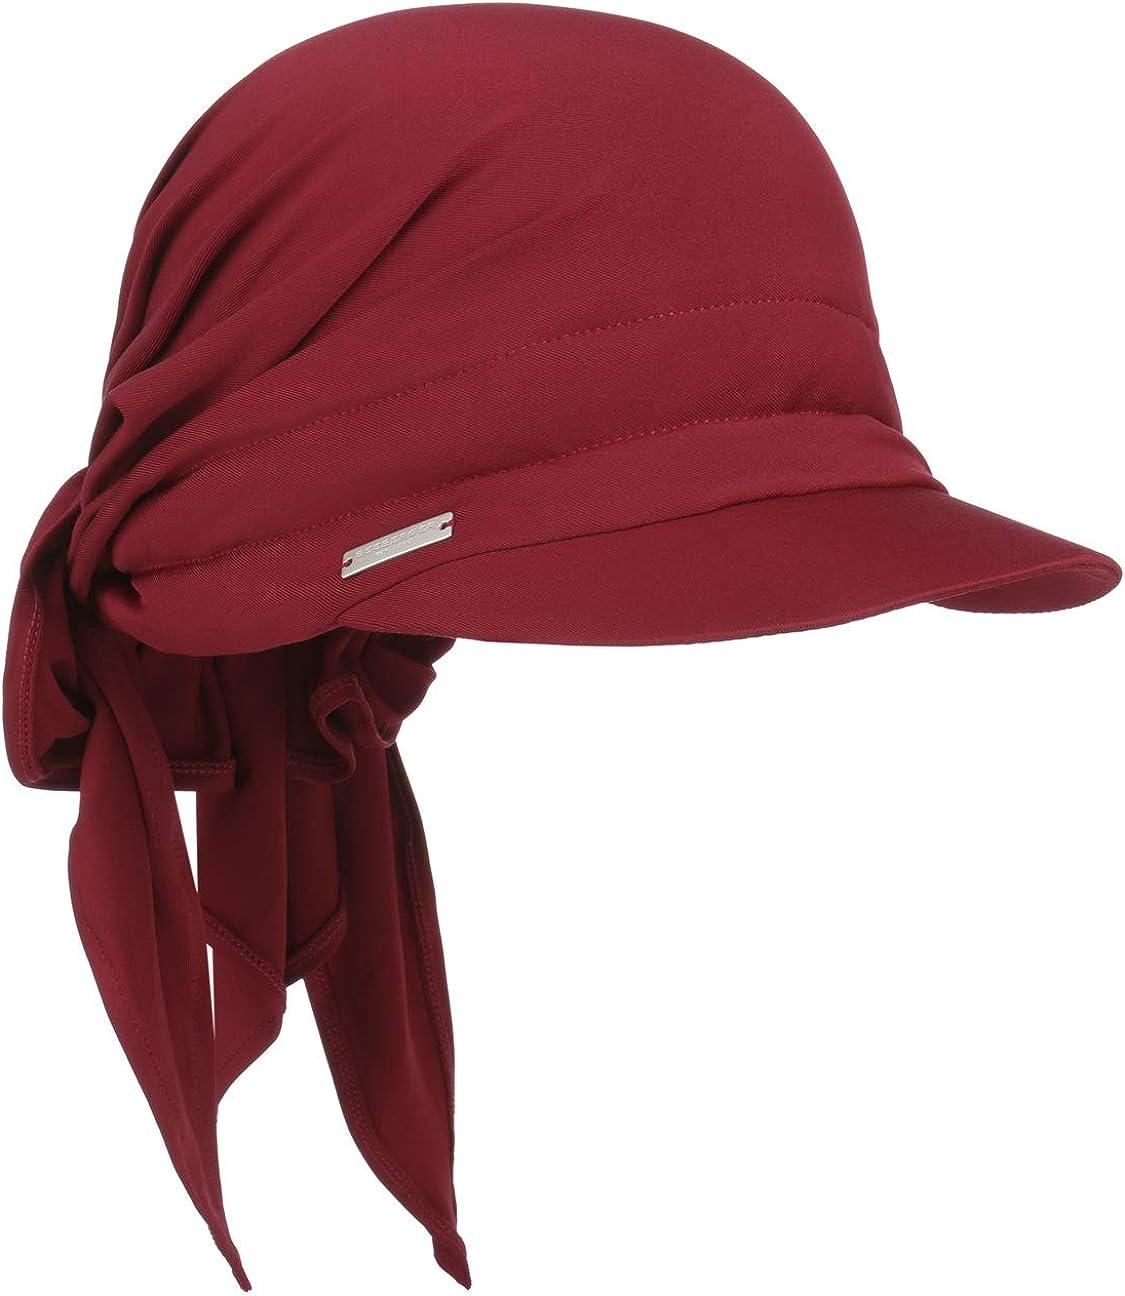 Seeberger Jersey Bandana Cap Damencap Sonnencap Visor Mit Schirm